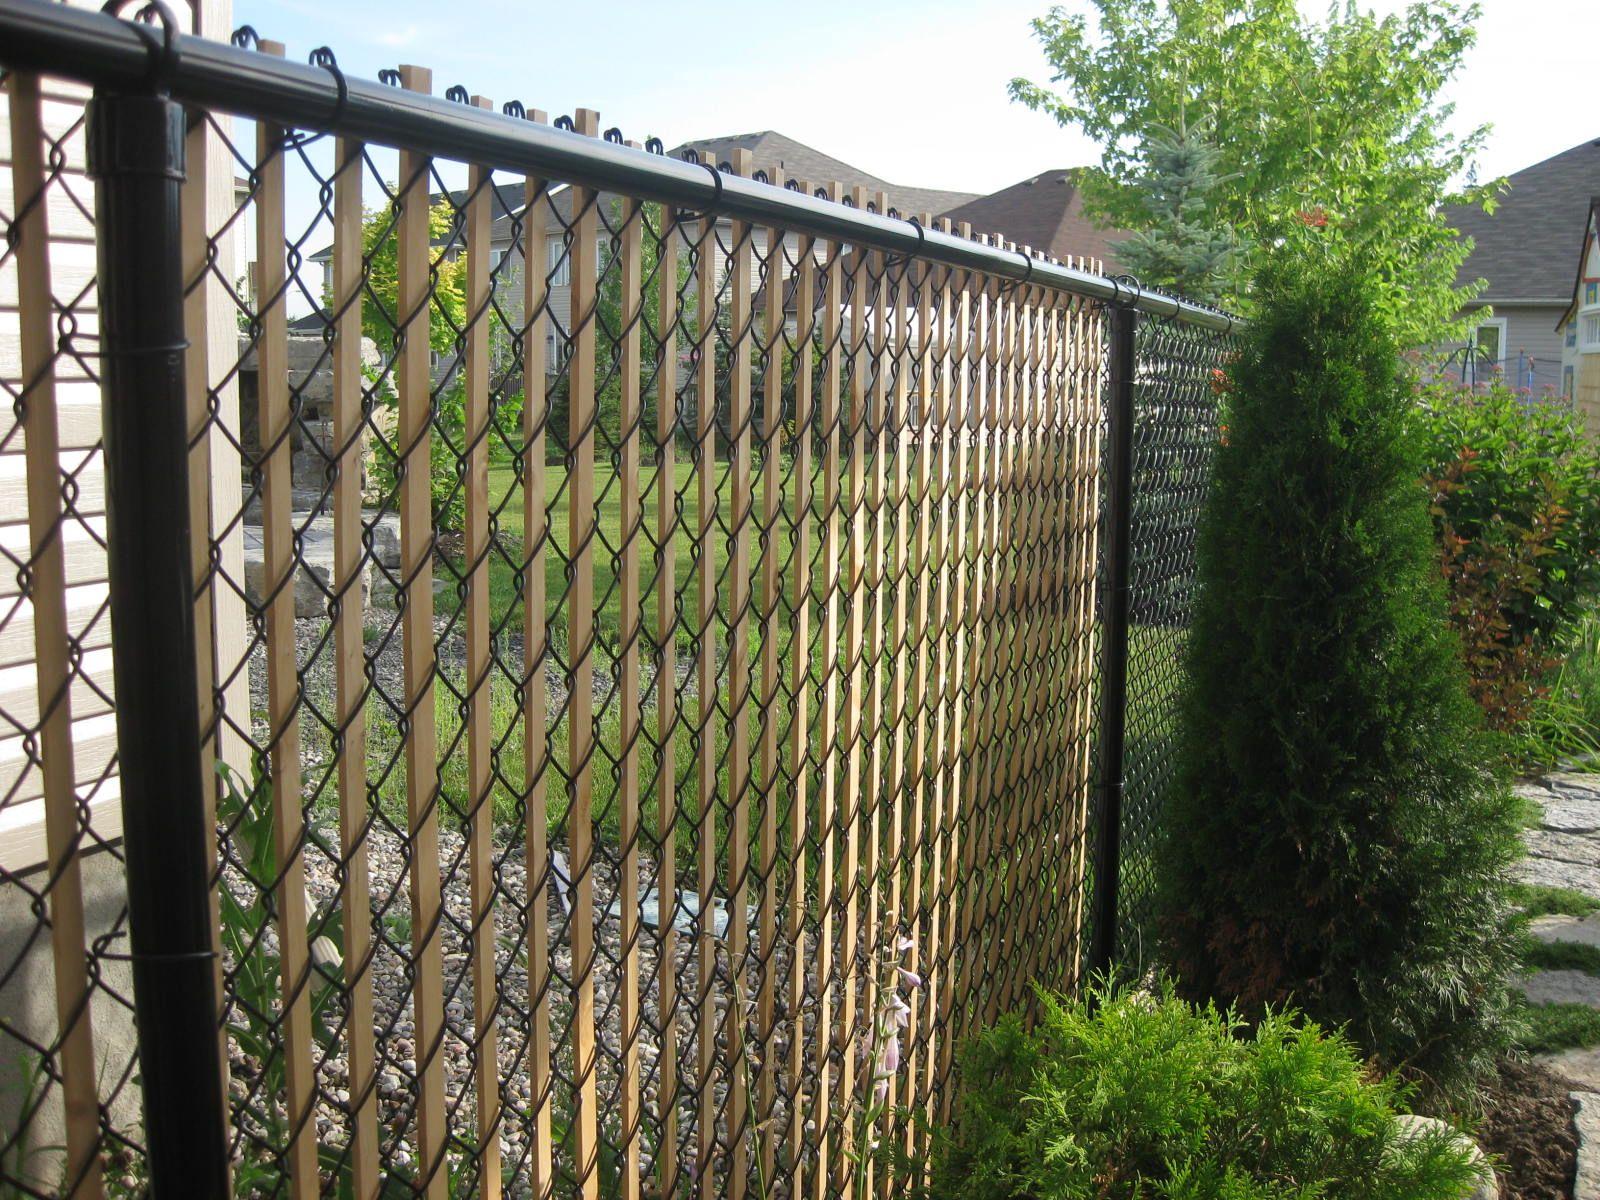 Privacy screen for chain link fence ebay -  Ricks Ramblings Blog Spruce Up A Chain Link Fence Insert Cedar Slats